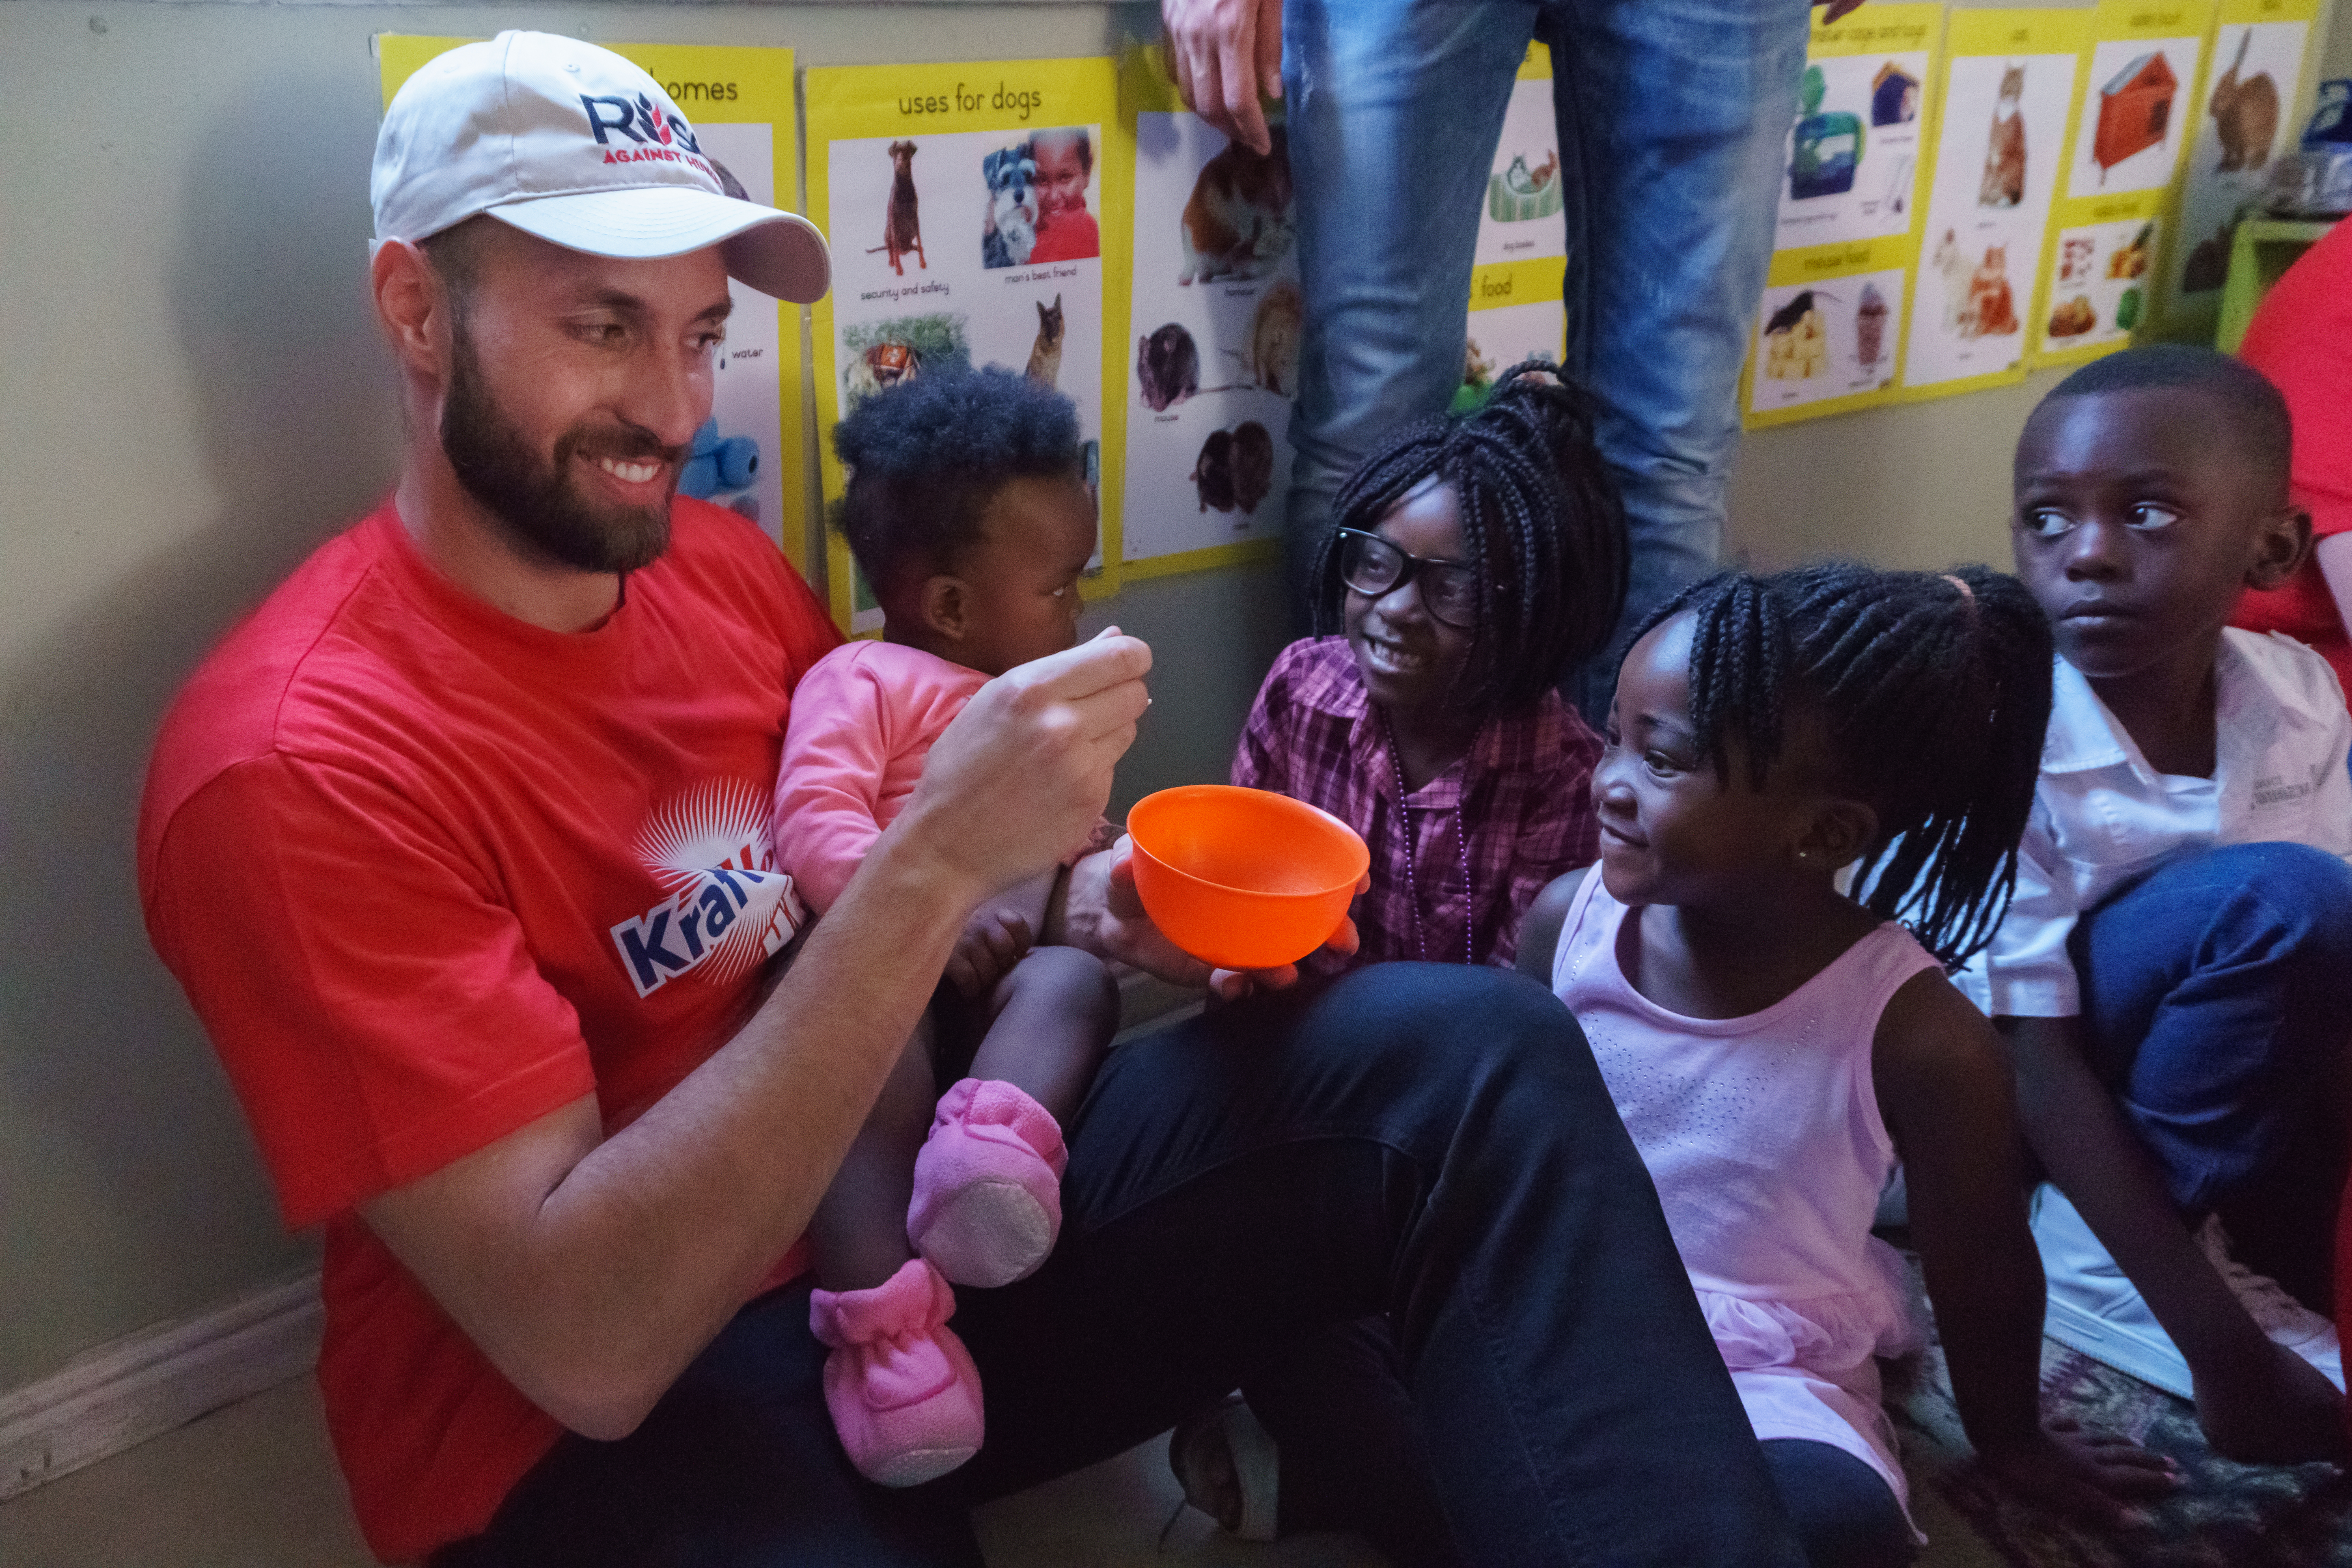 South African School Kids Meet Kraft Heinz Employees Fighting To End